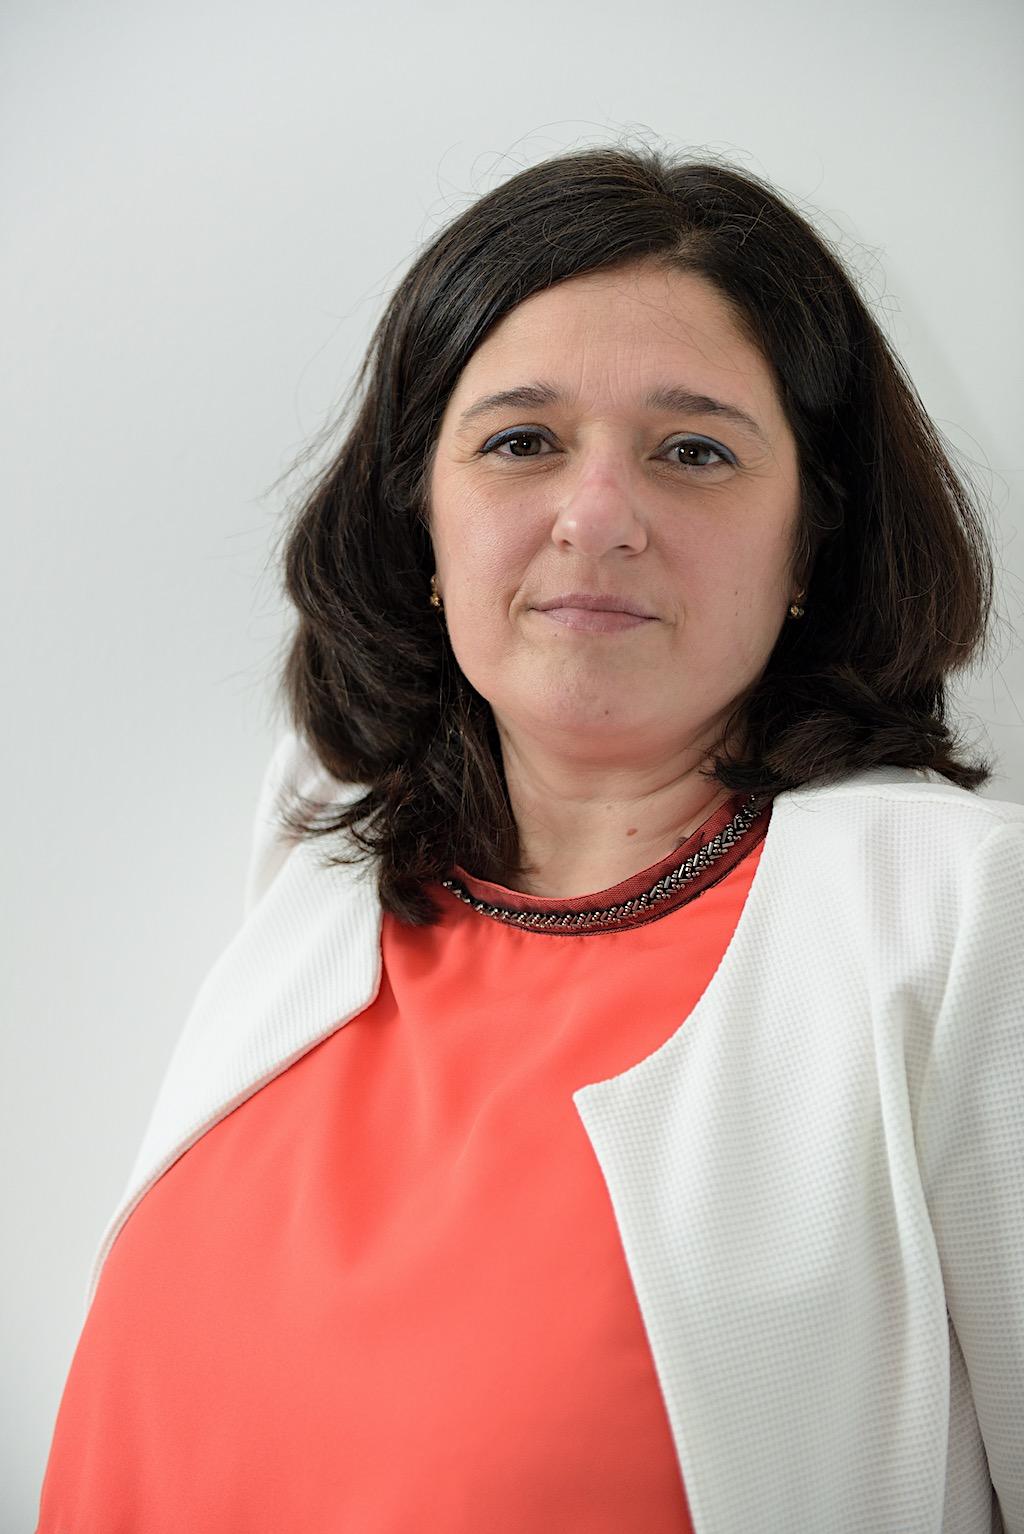 Vincenza D'Anna